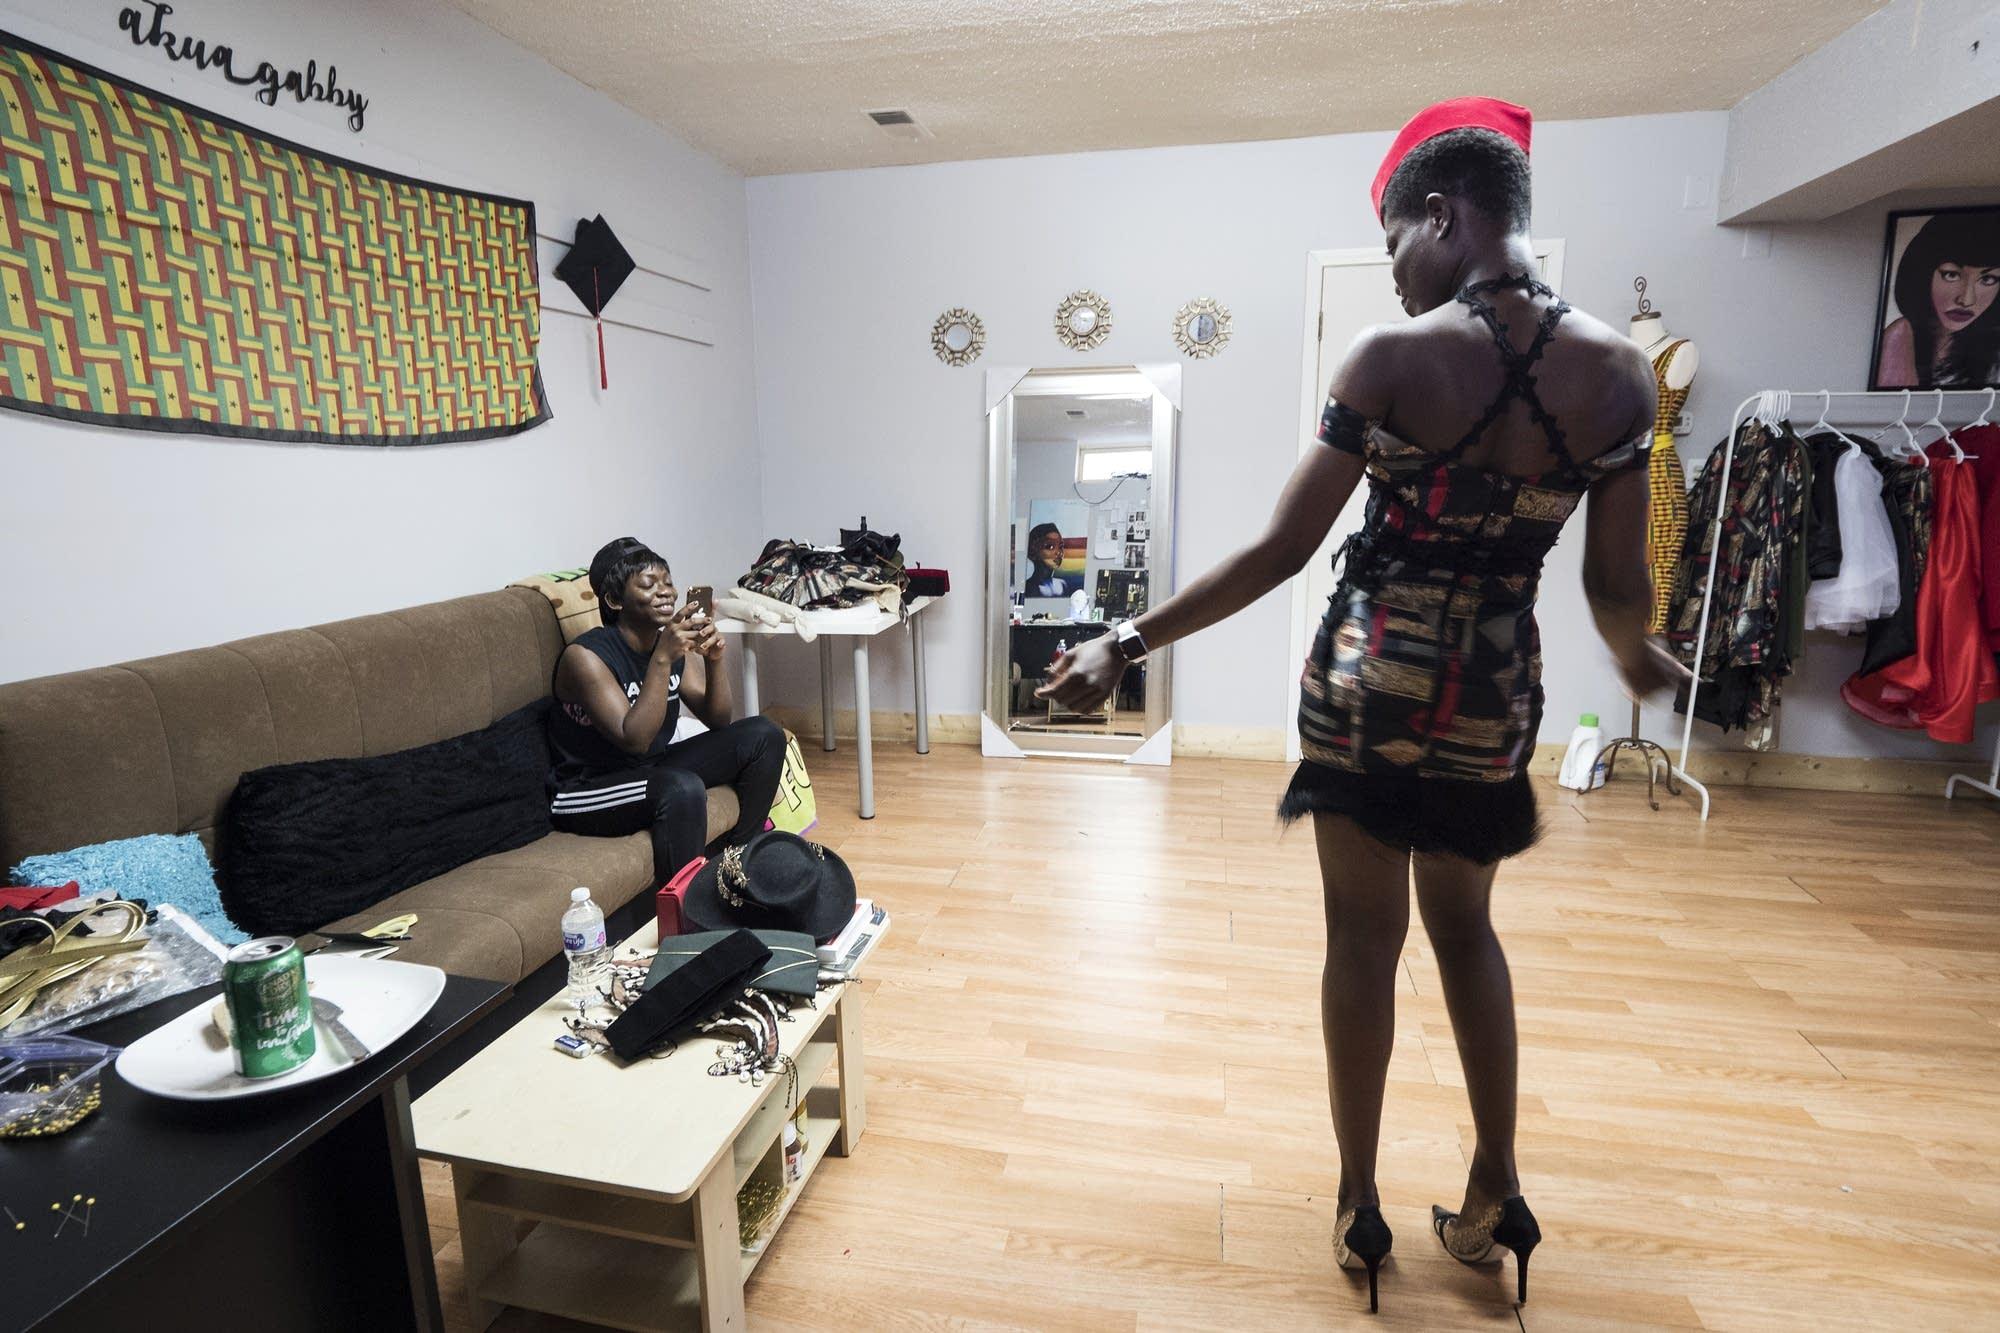 Designer Jacqueline Addison takes a video of model Setor Nyendu walking.